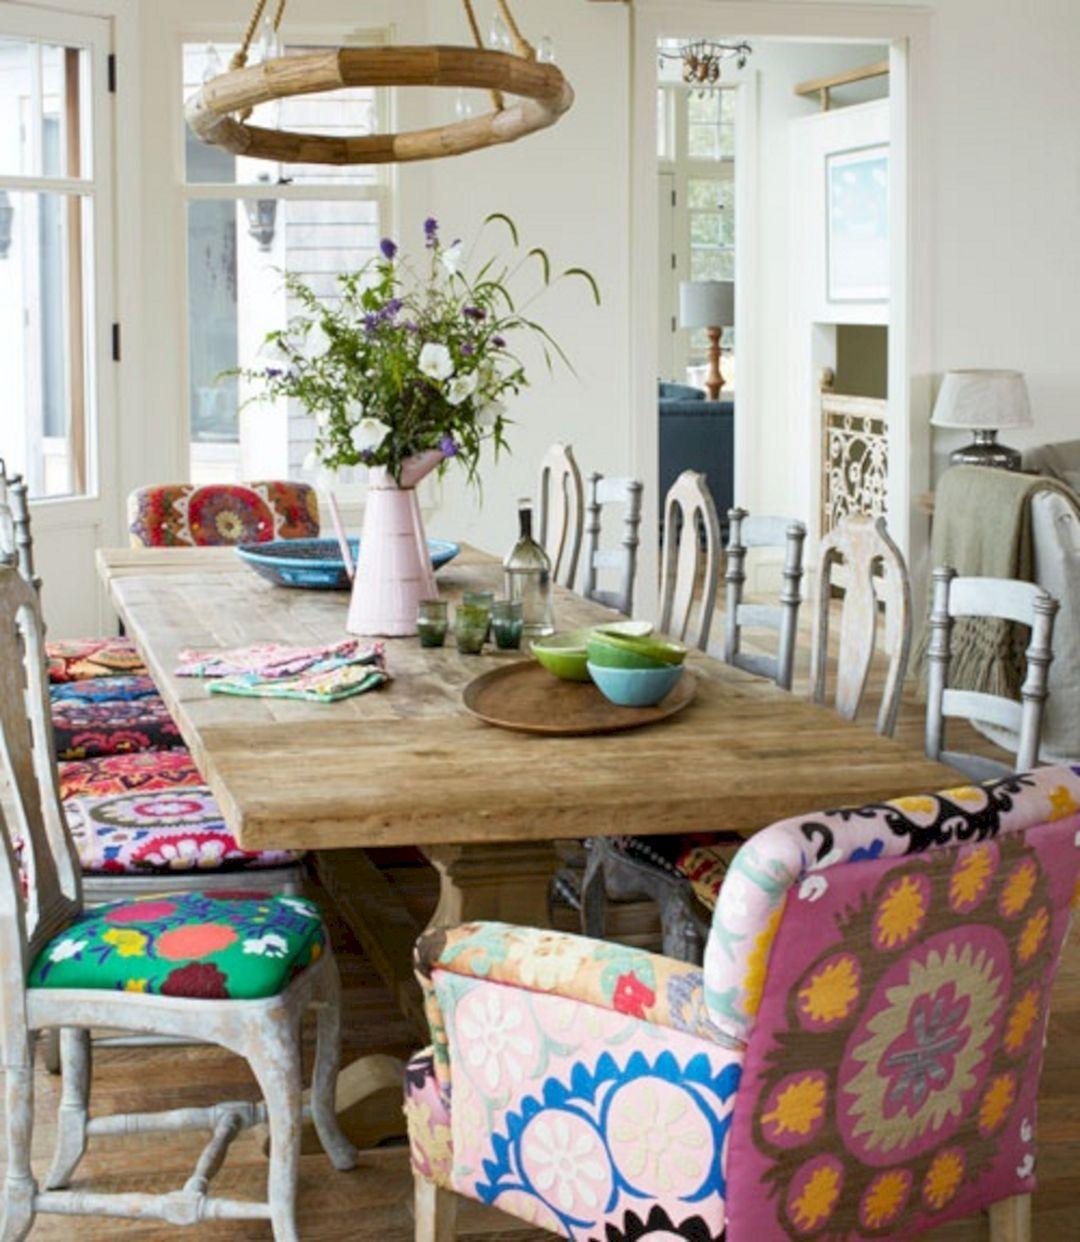 75 simple and minimalist dining table decor ideas 25039 dining table decor bohemian dining on boho chic kitchen table decor id=22299